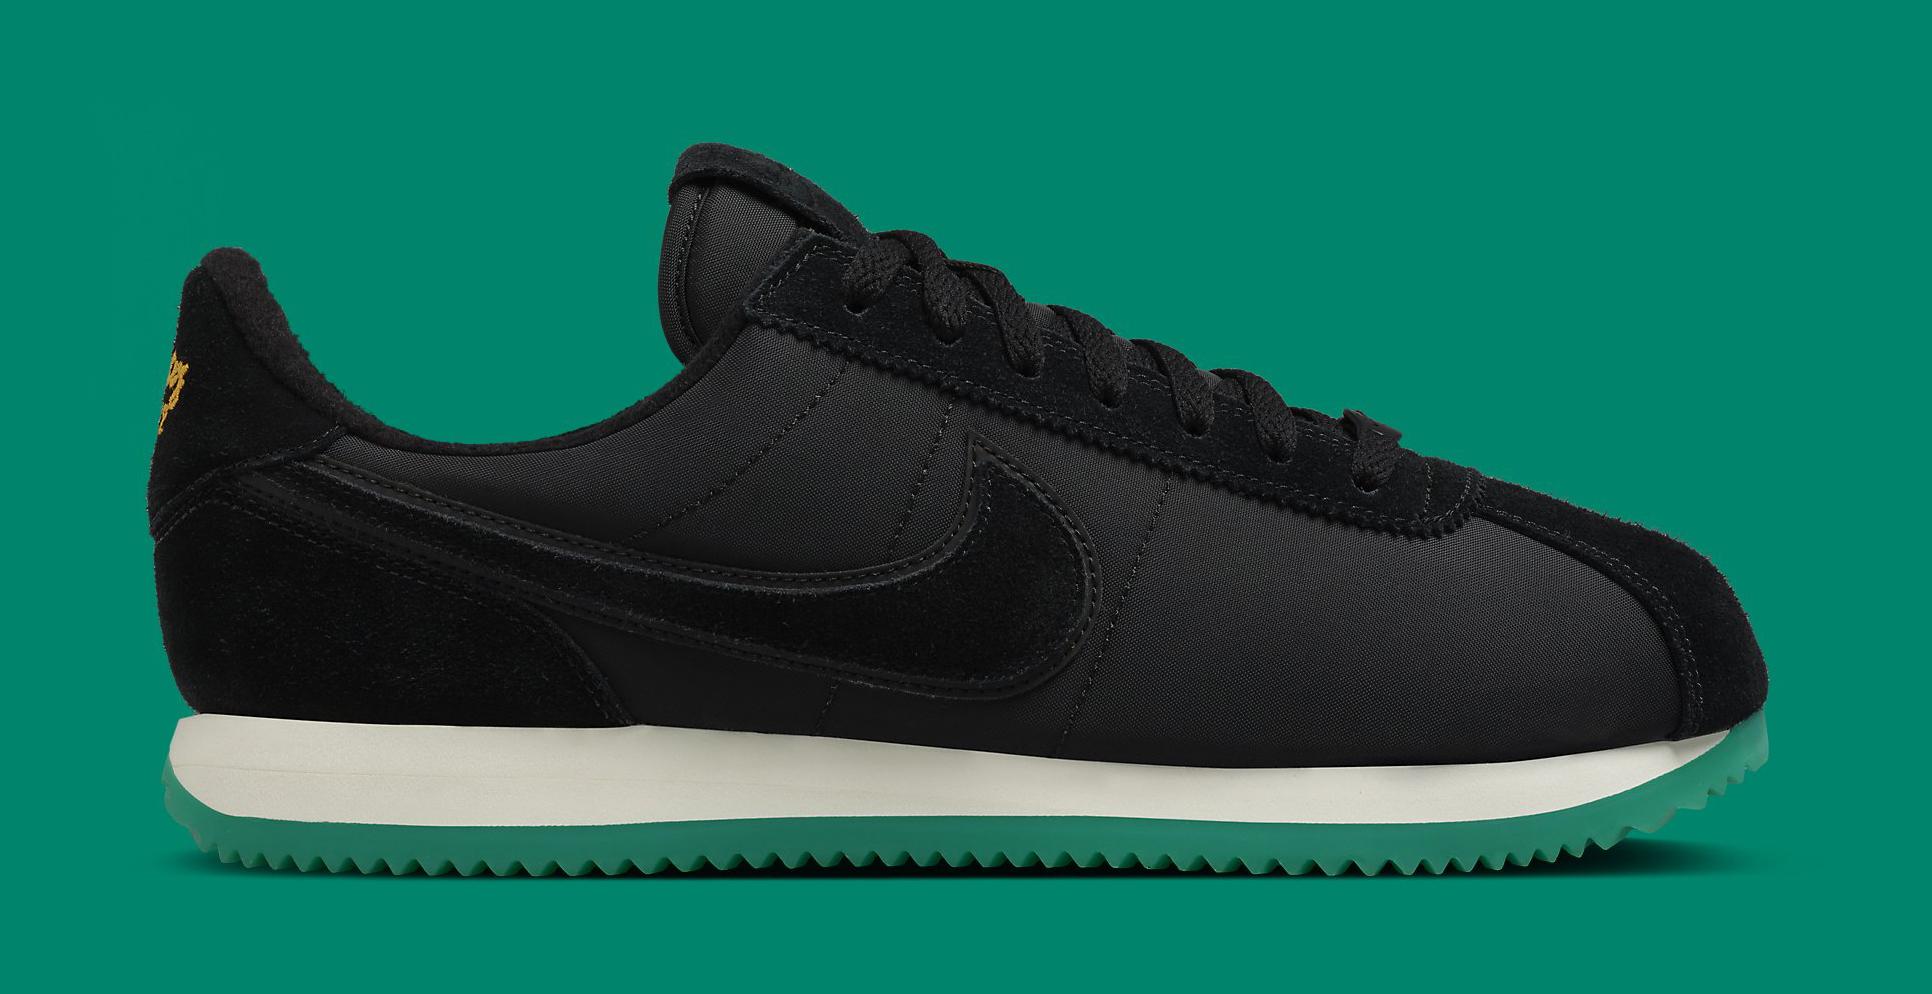 low priced 3ba8c e2f71 Nike Cortez Latino Heritage Month 885407-001 Profile